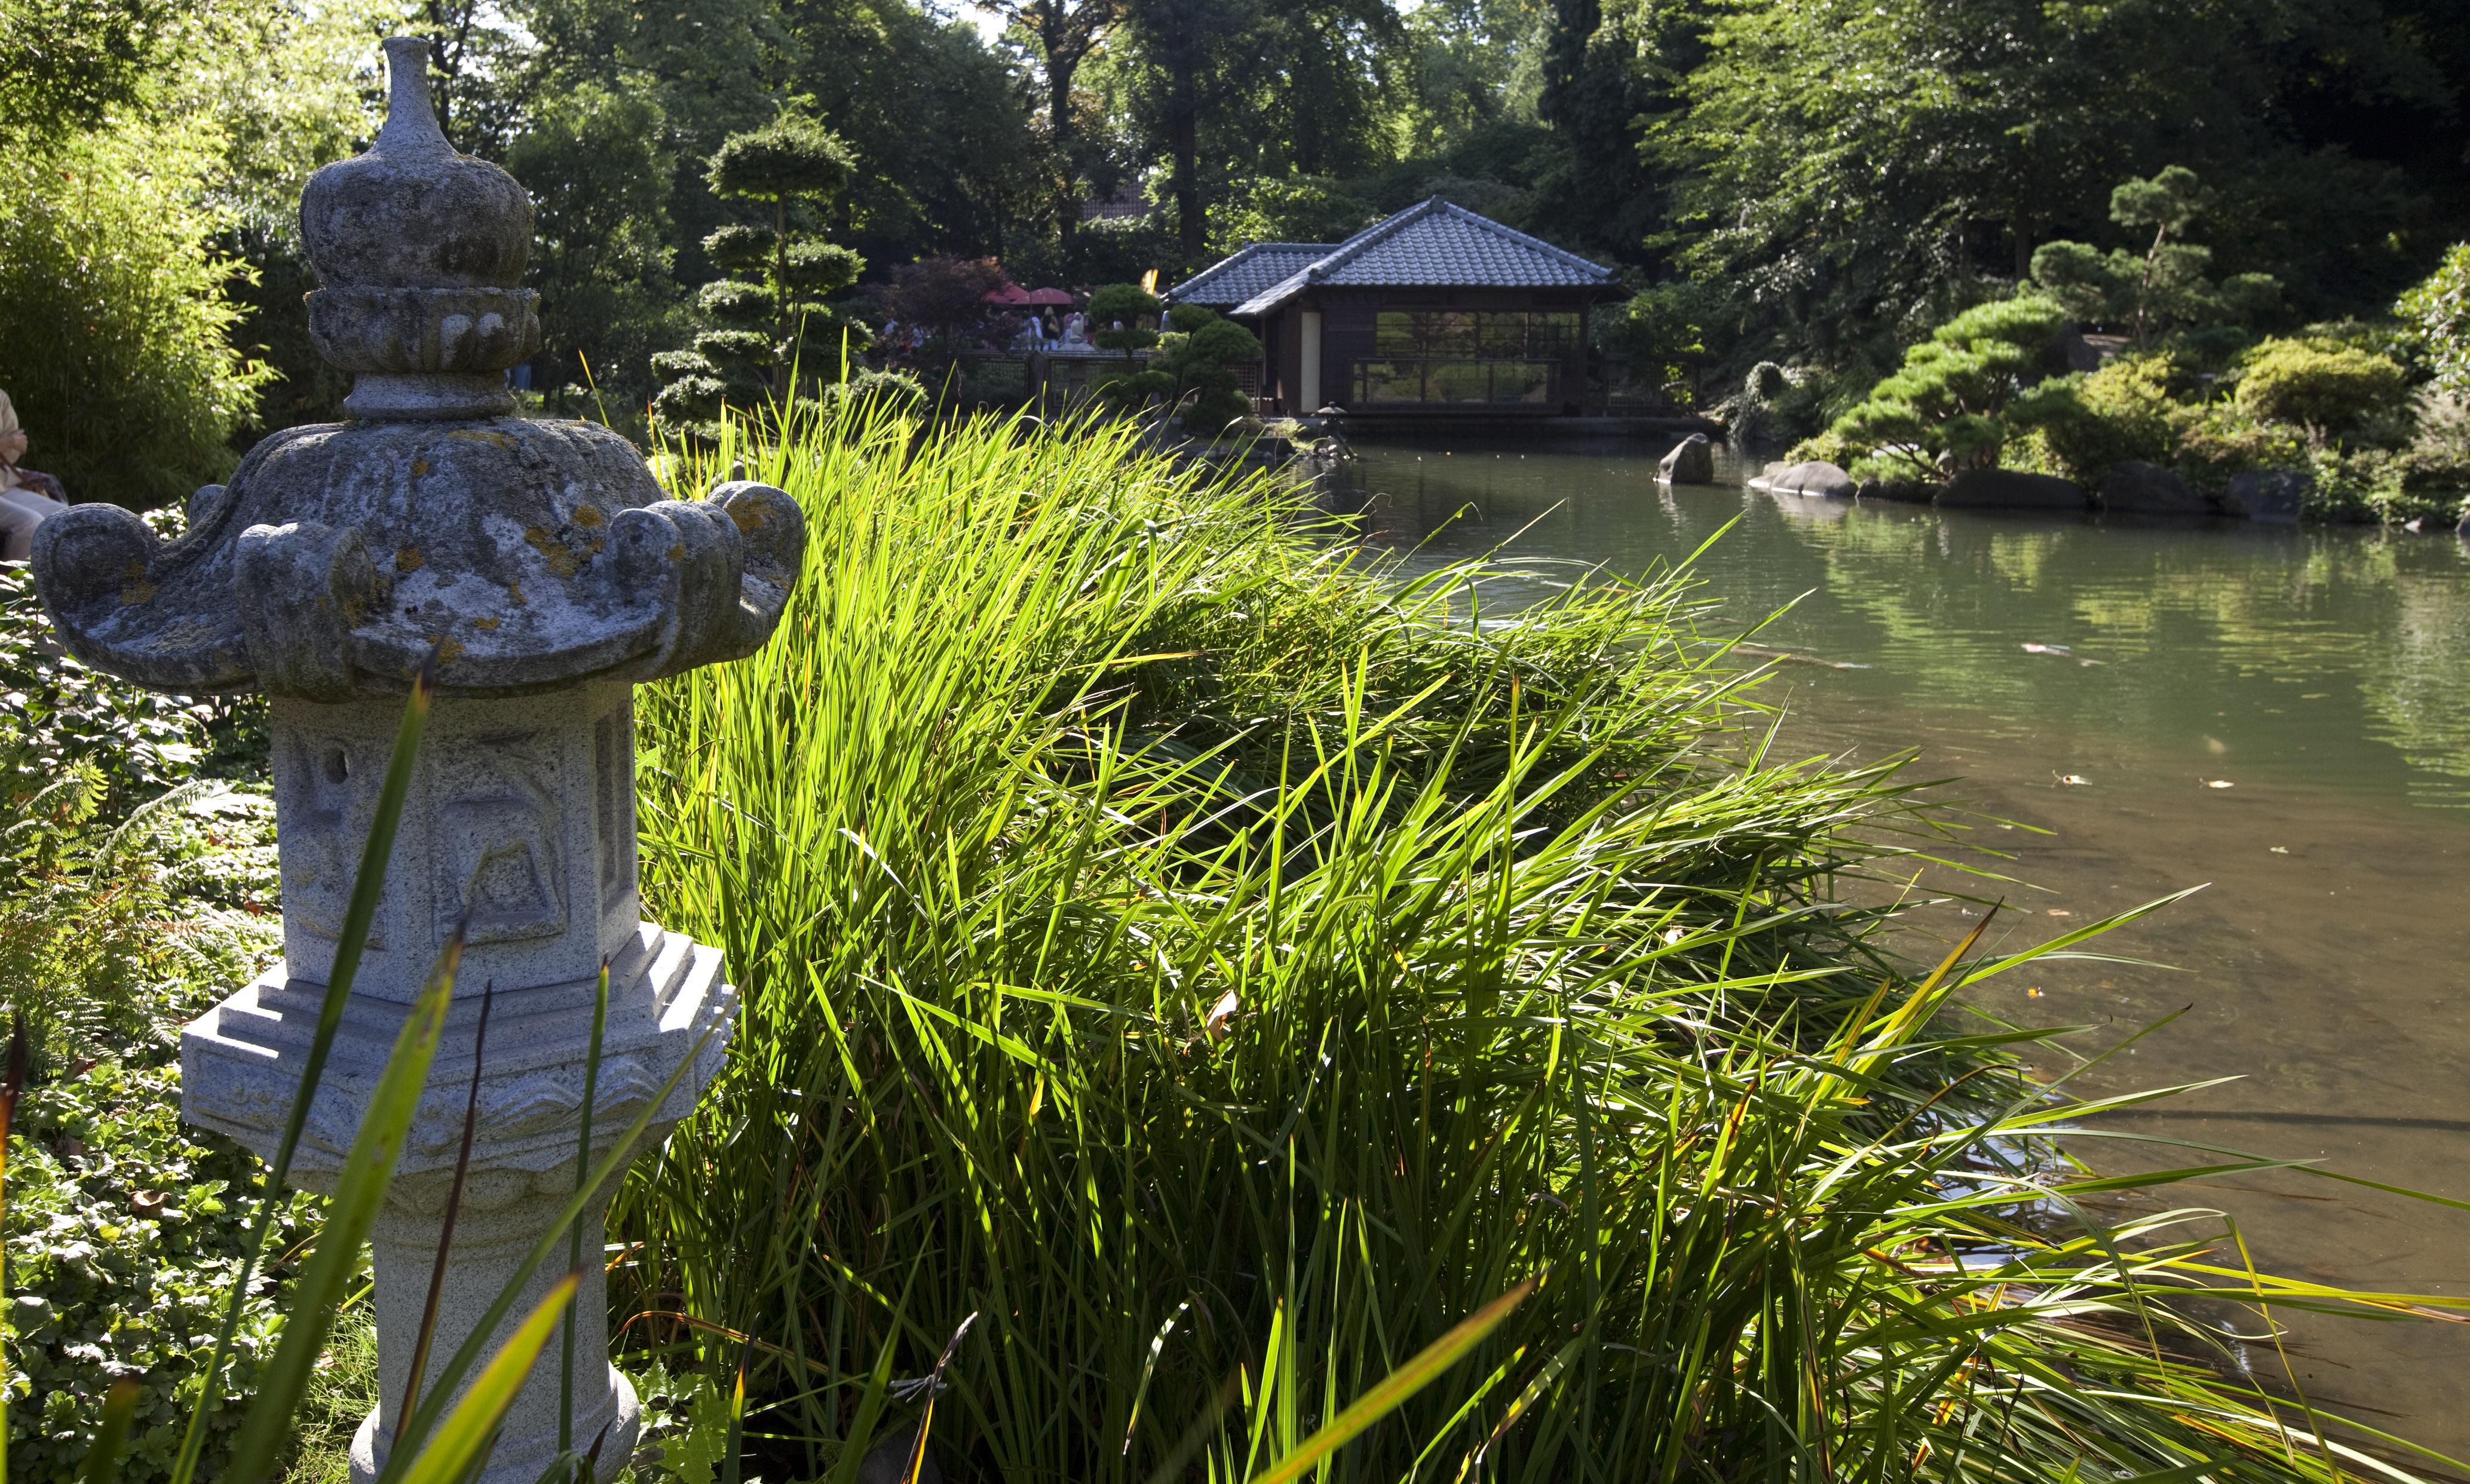 Japanischer Garten Stadt Kaiserslautern